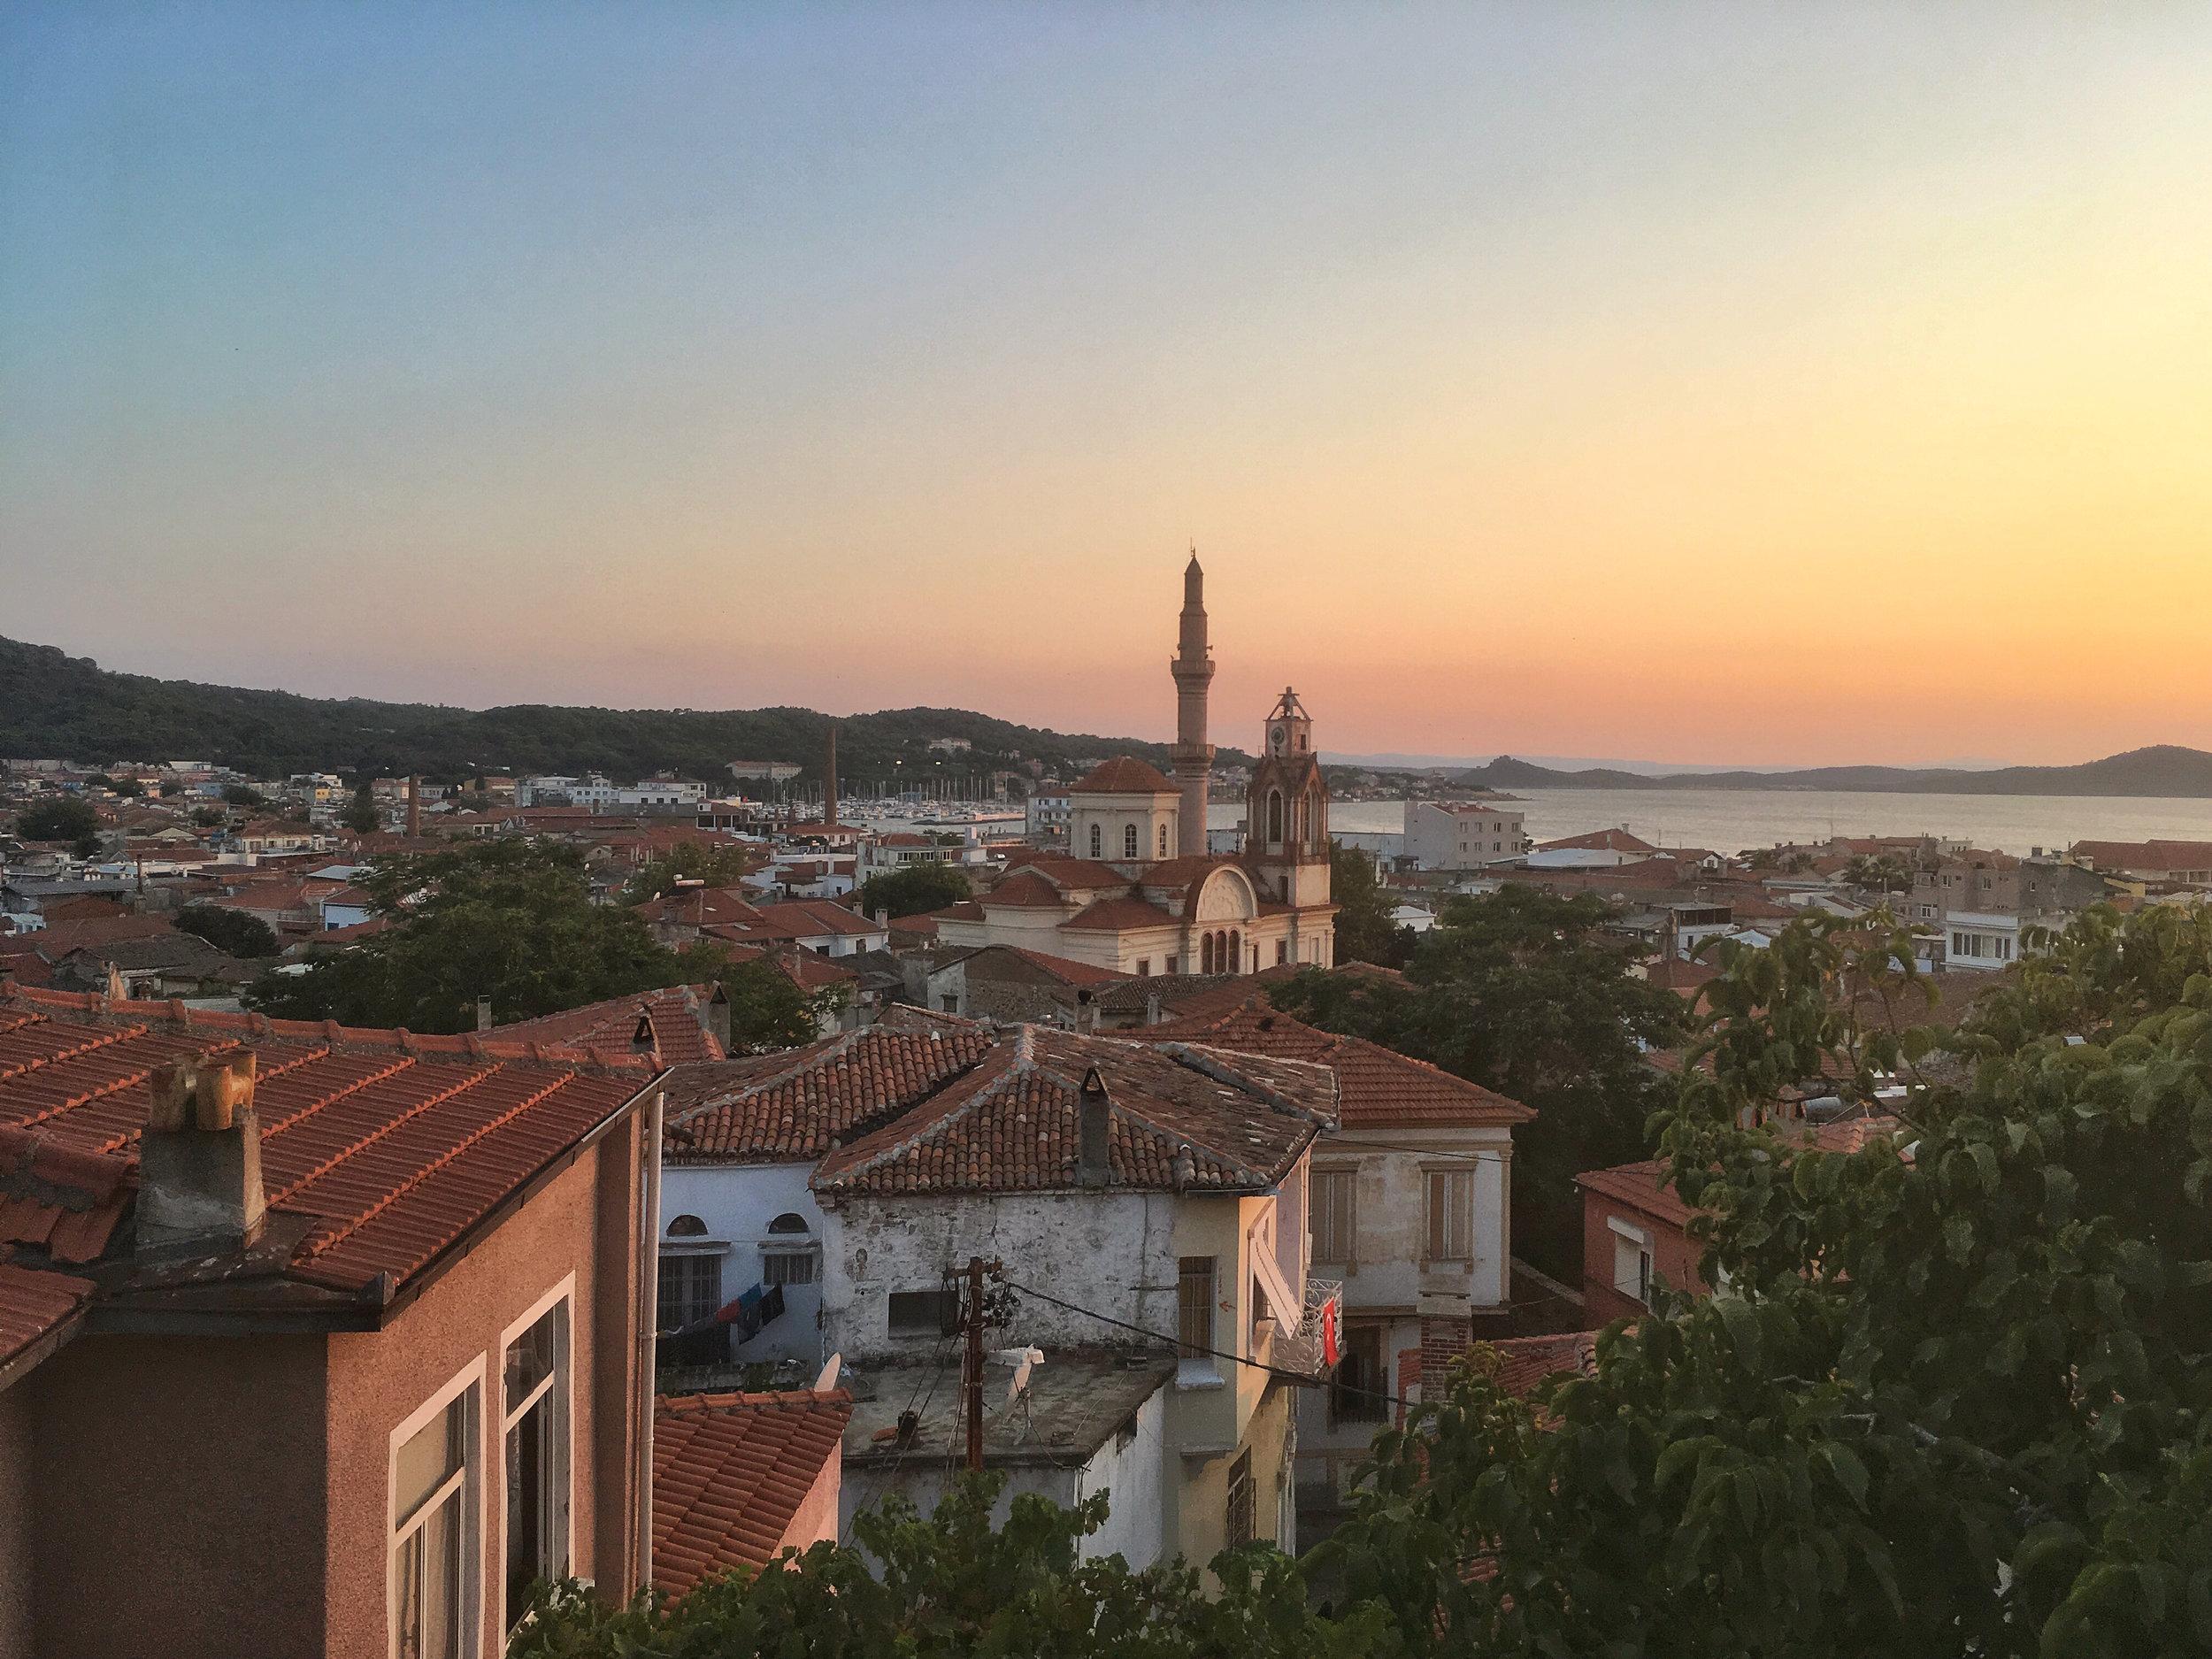 A glimpse into the beauty of the Turkish coast